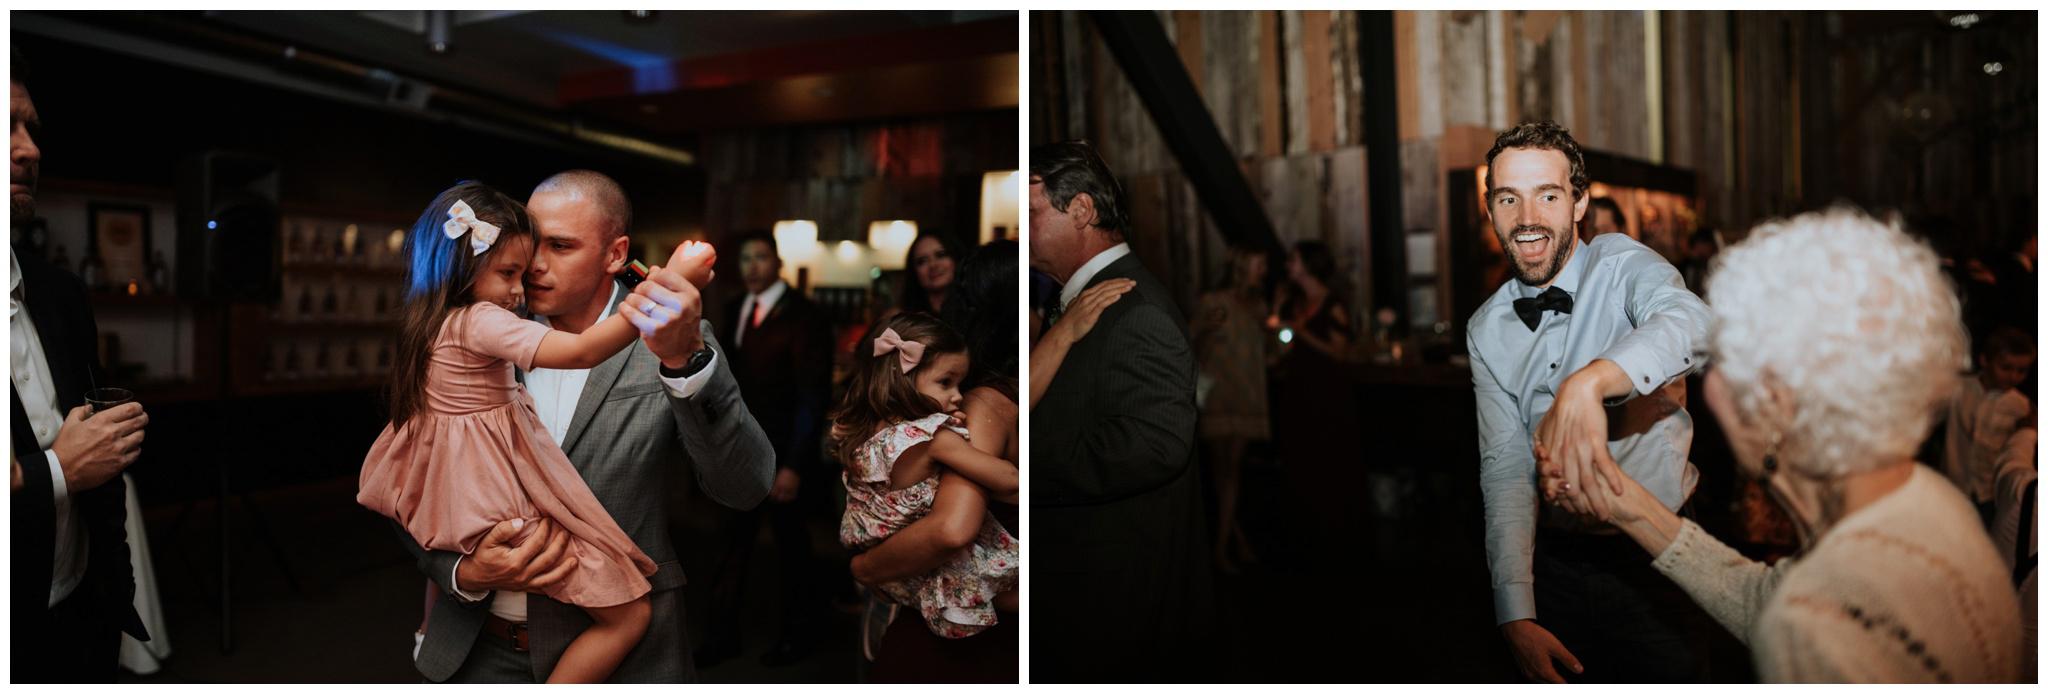 alyssa-keiran-westland-distillery-urban-seattle-wedding-photographer-caitlyn-nikula-155.jpg